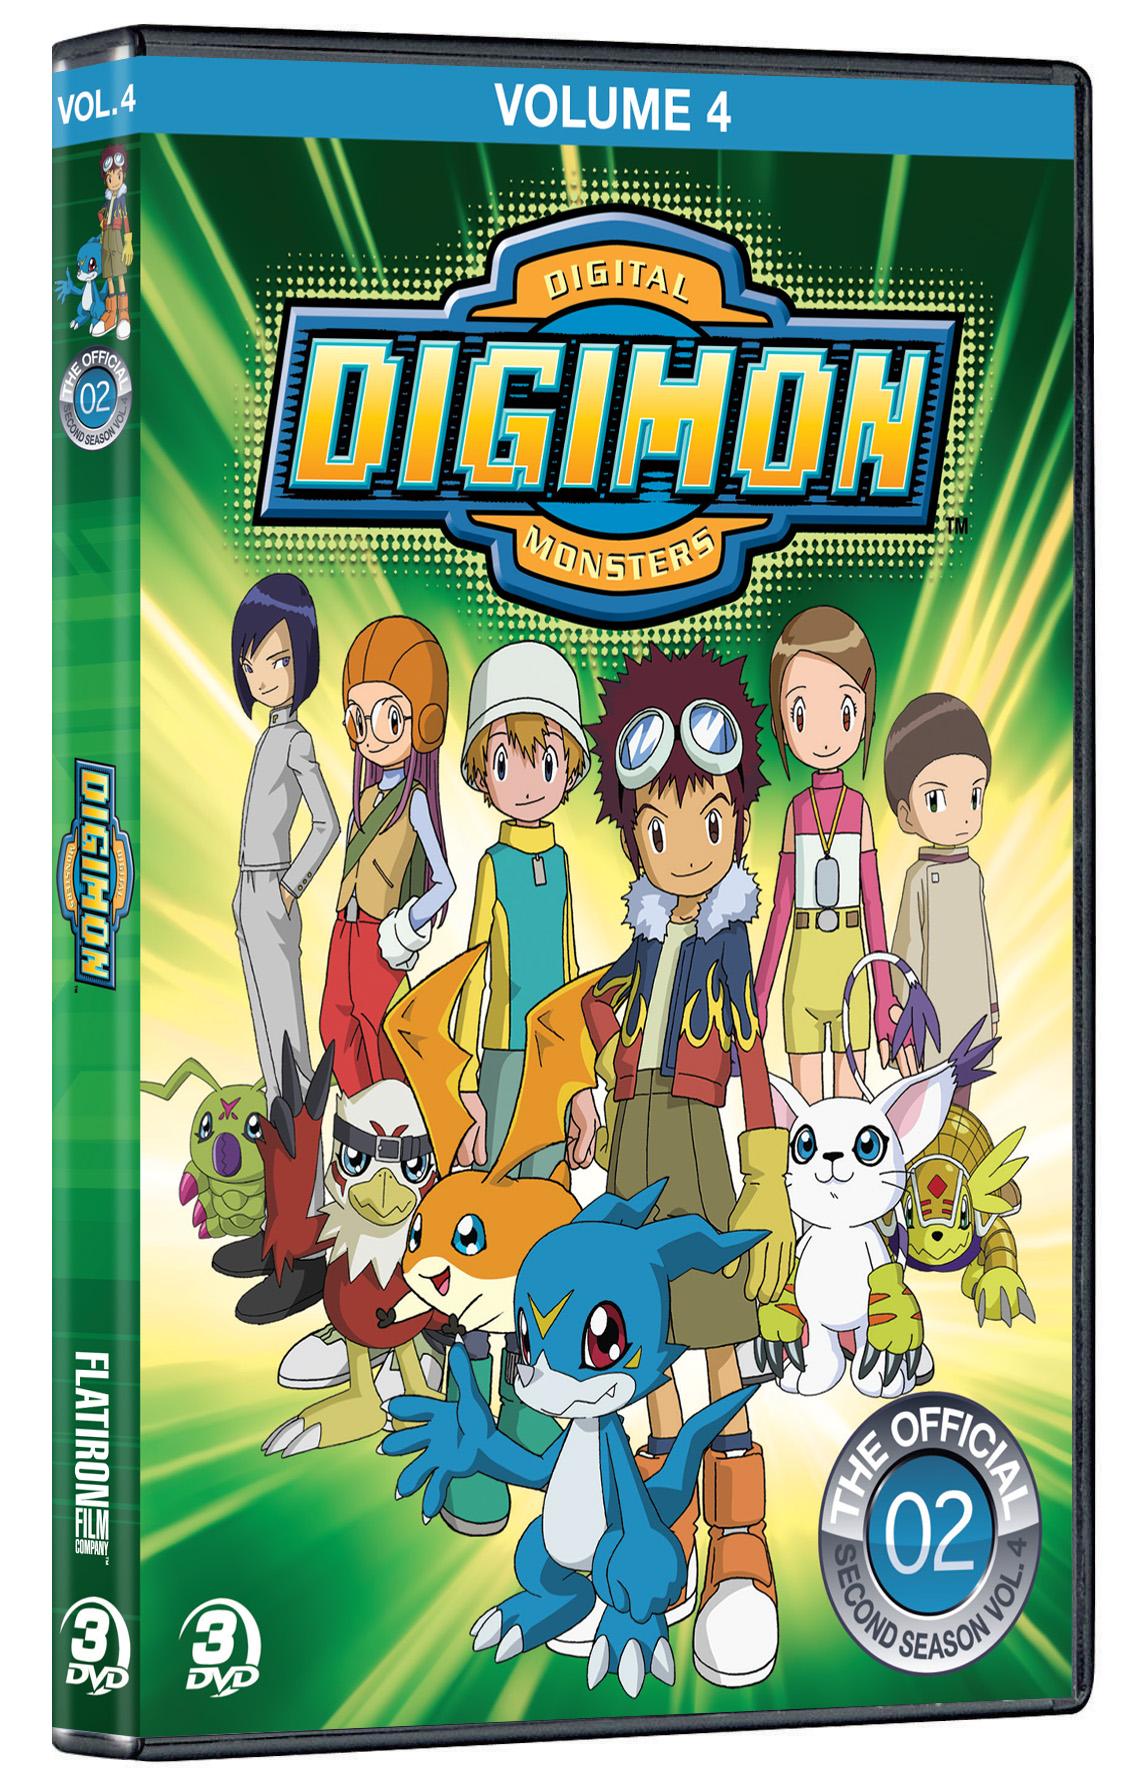 Digimon Volume 4 DVD